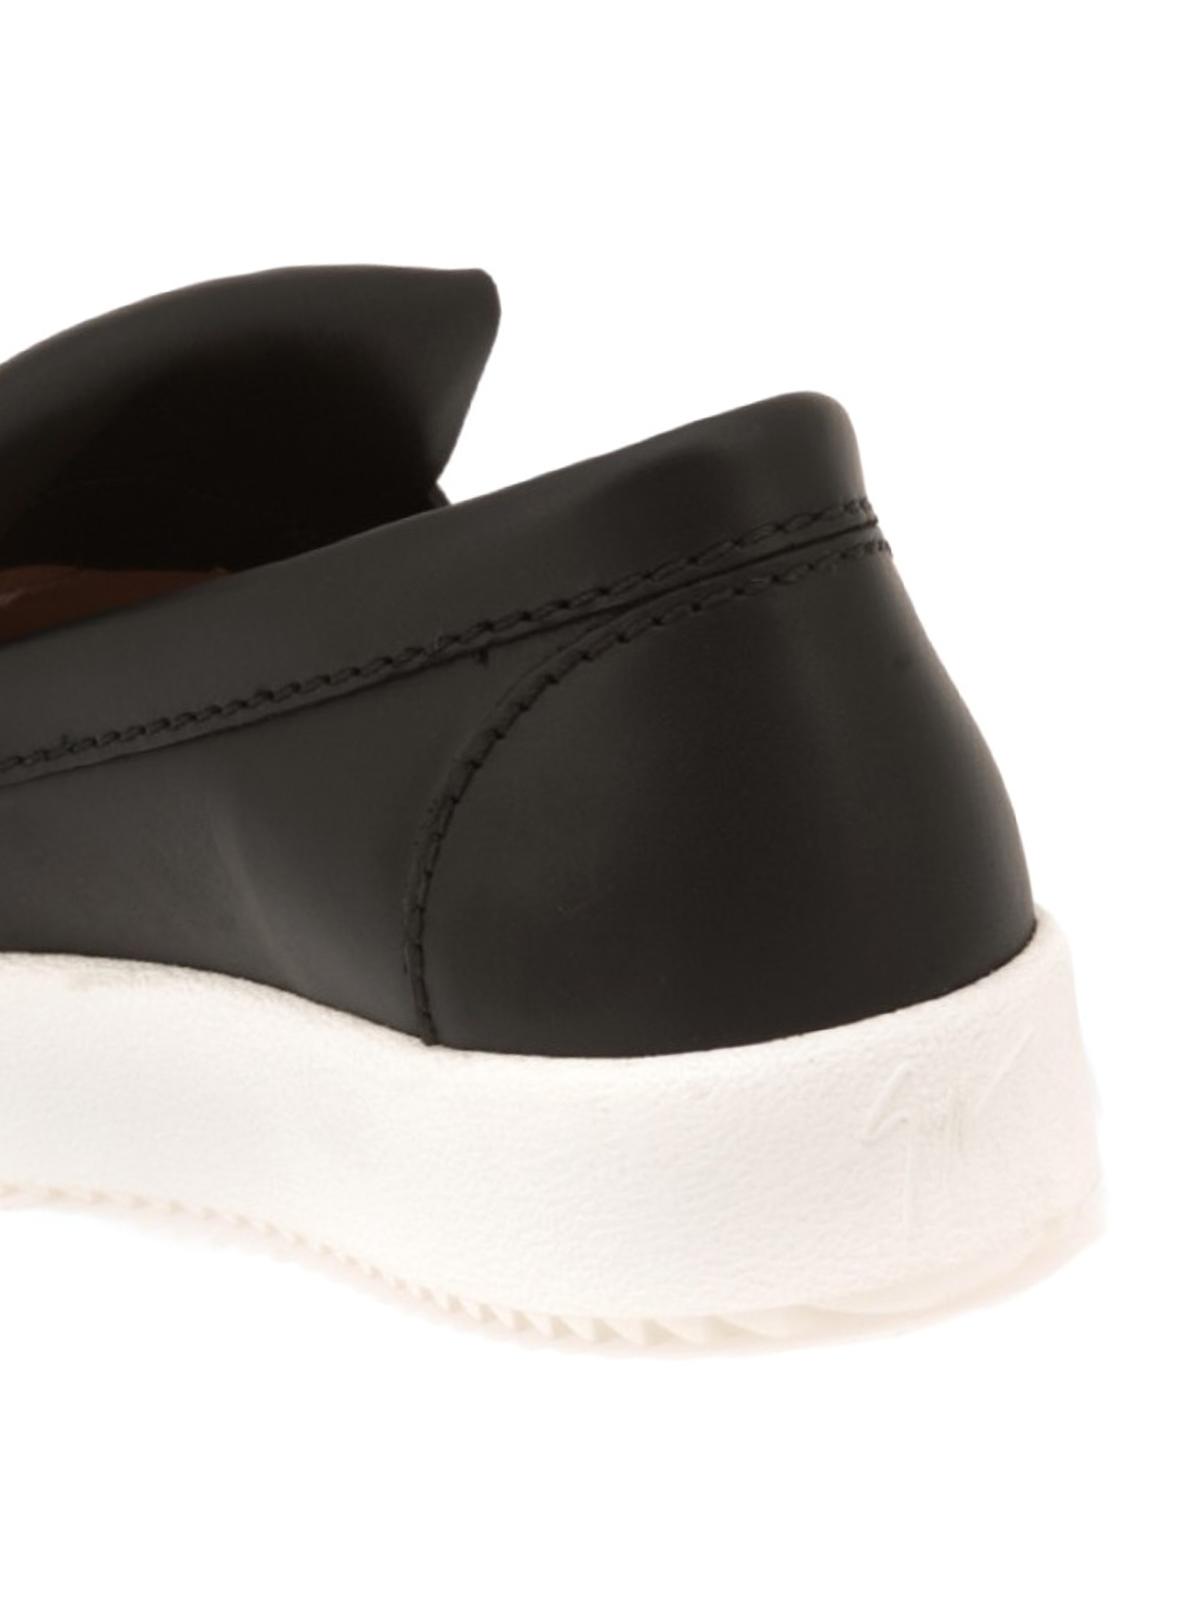 96ac670b8d9eb giuseppe zanotti black gold heels treatment discount ladies shoes online